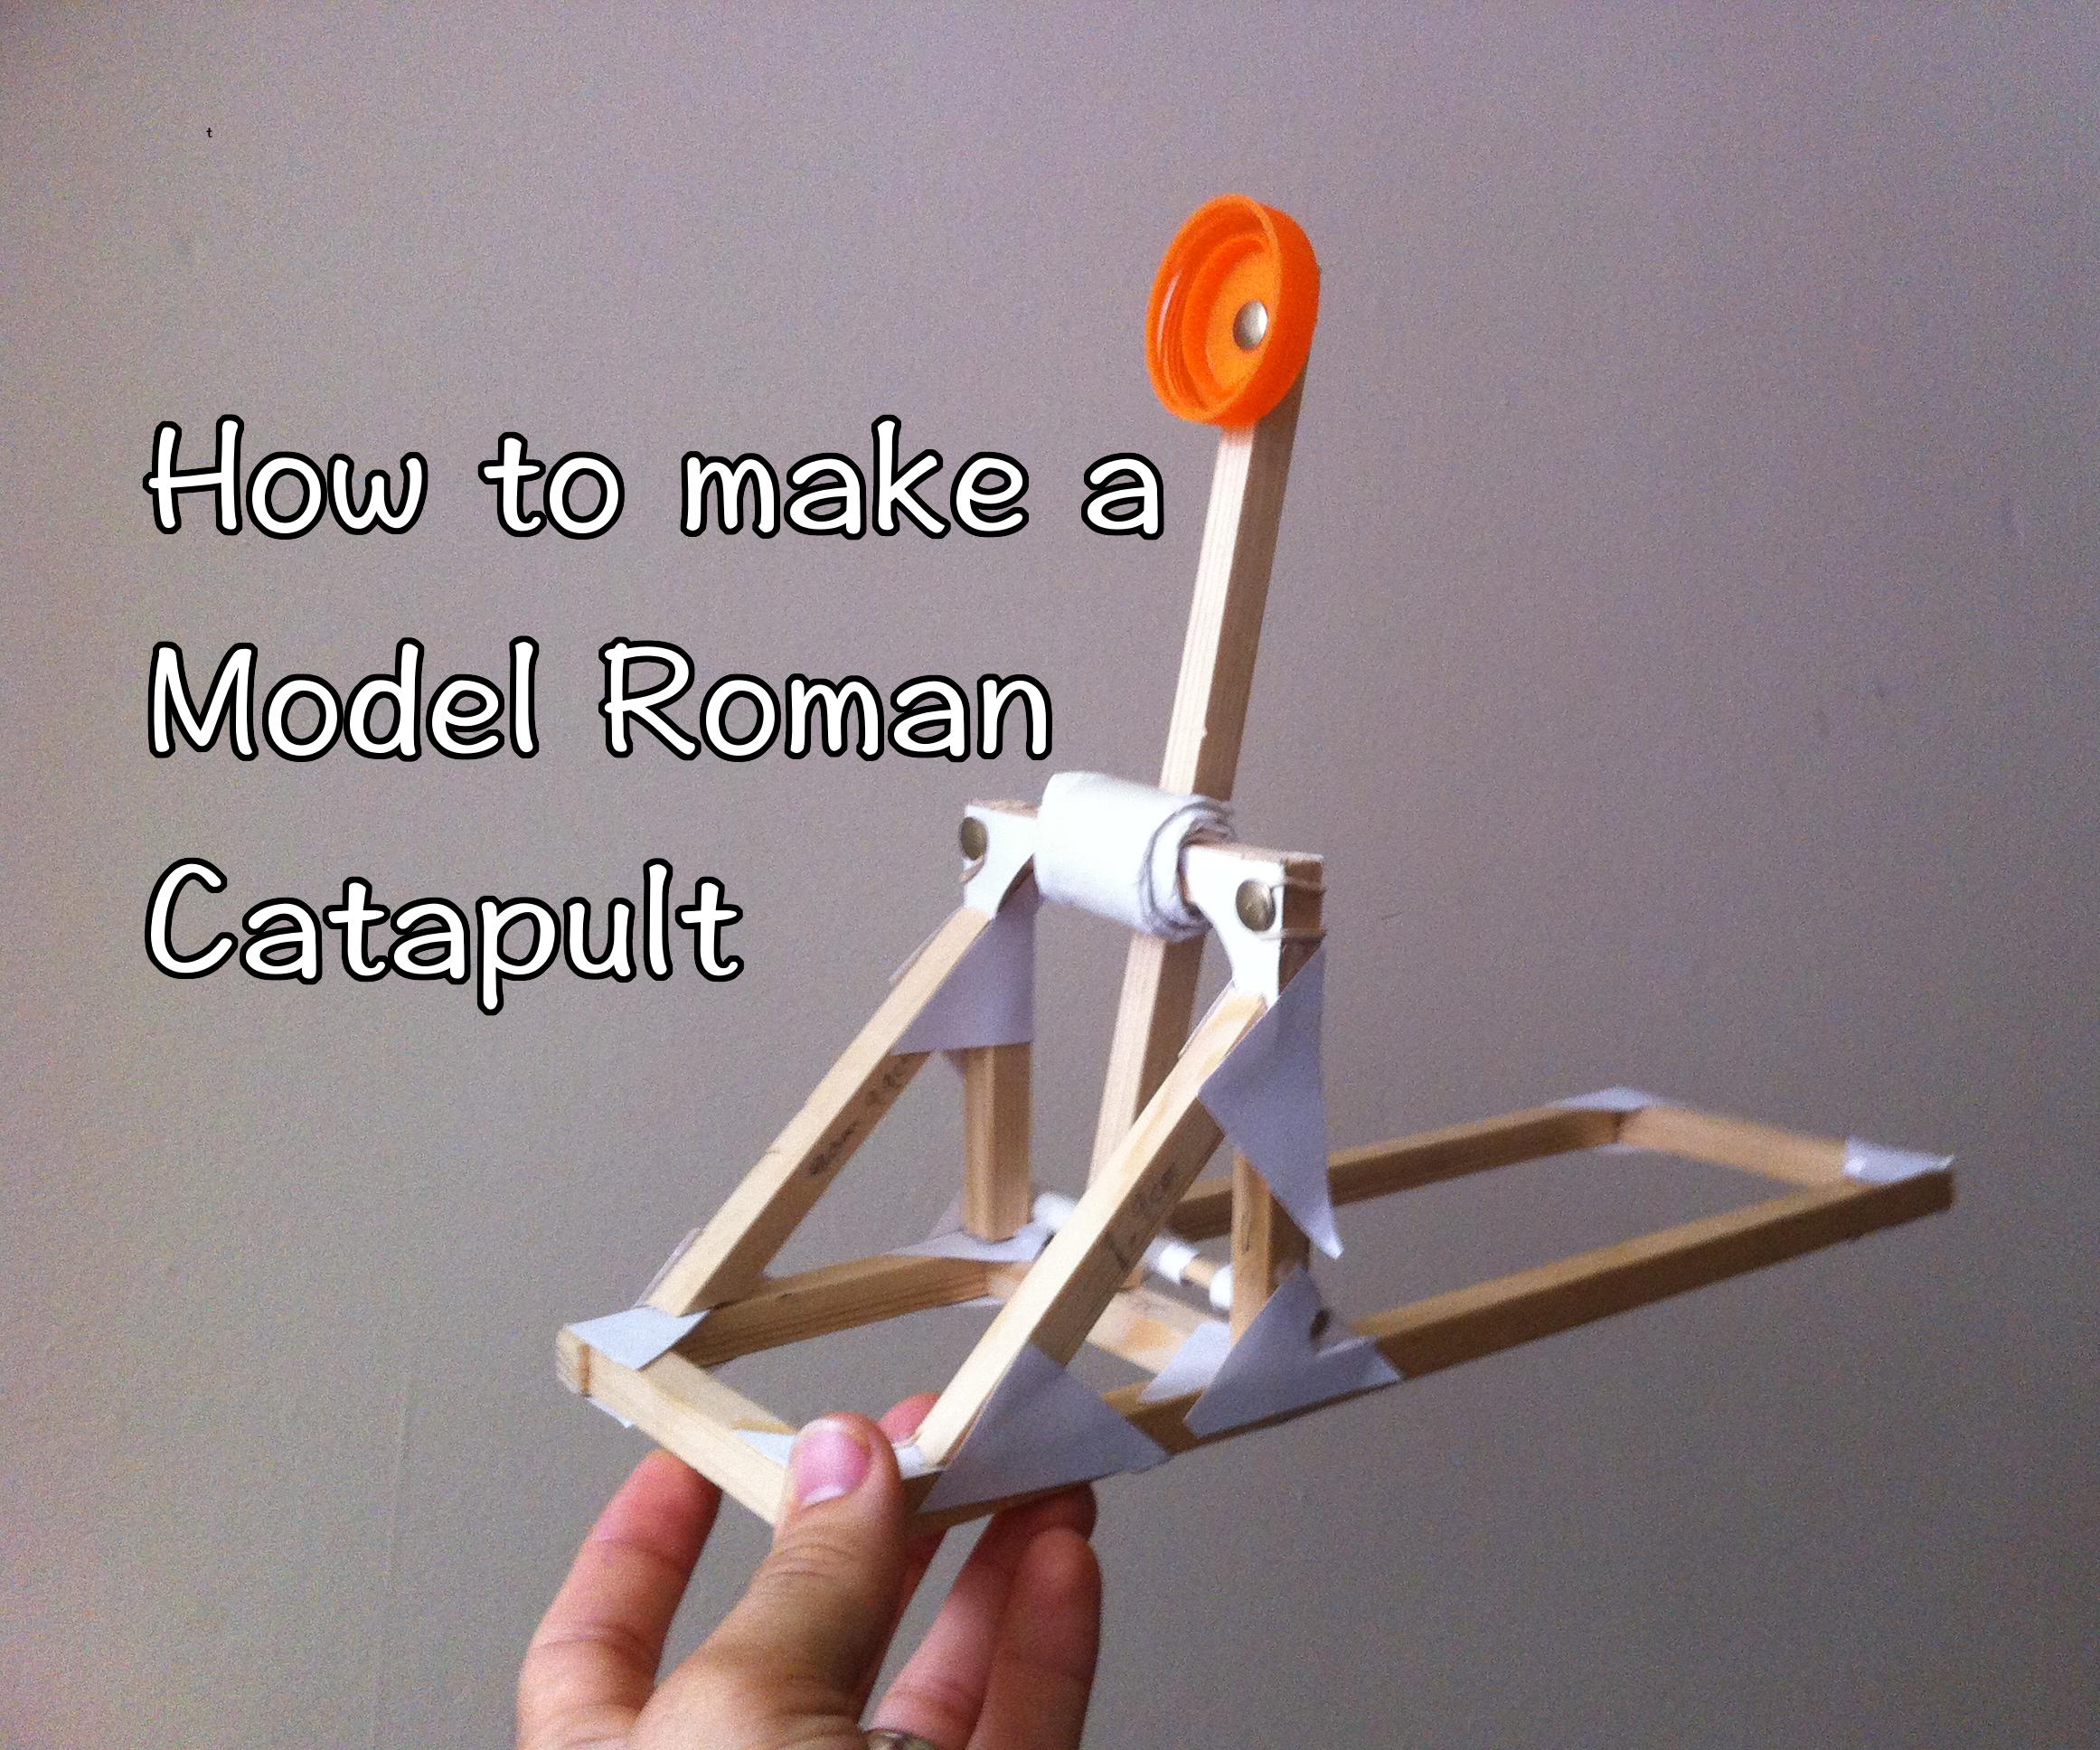 School DT projects: Model Roman catapult